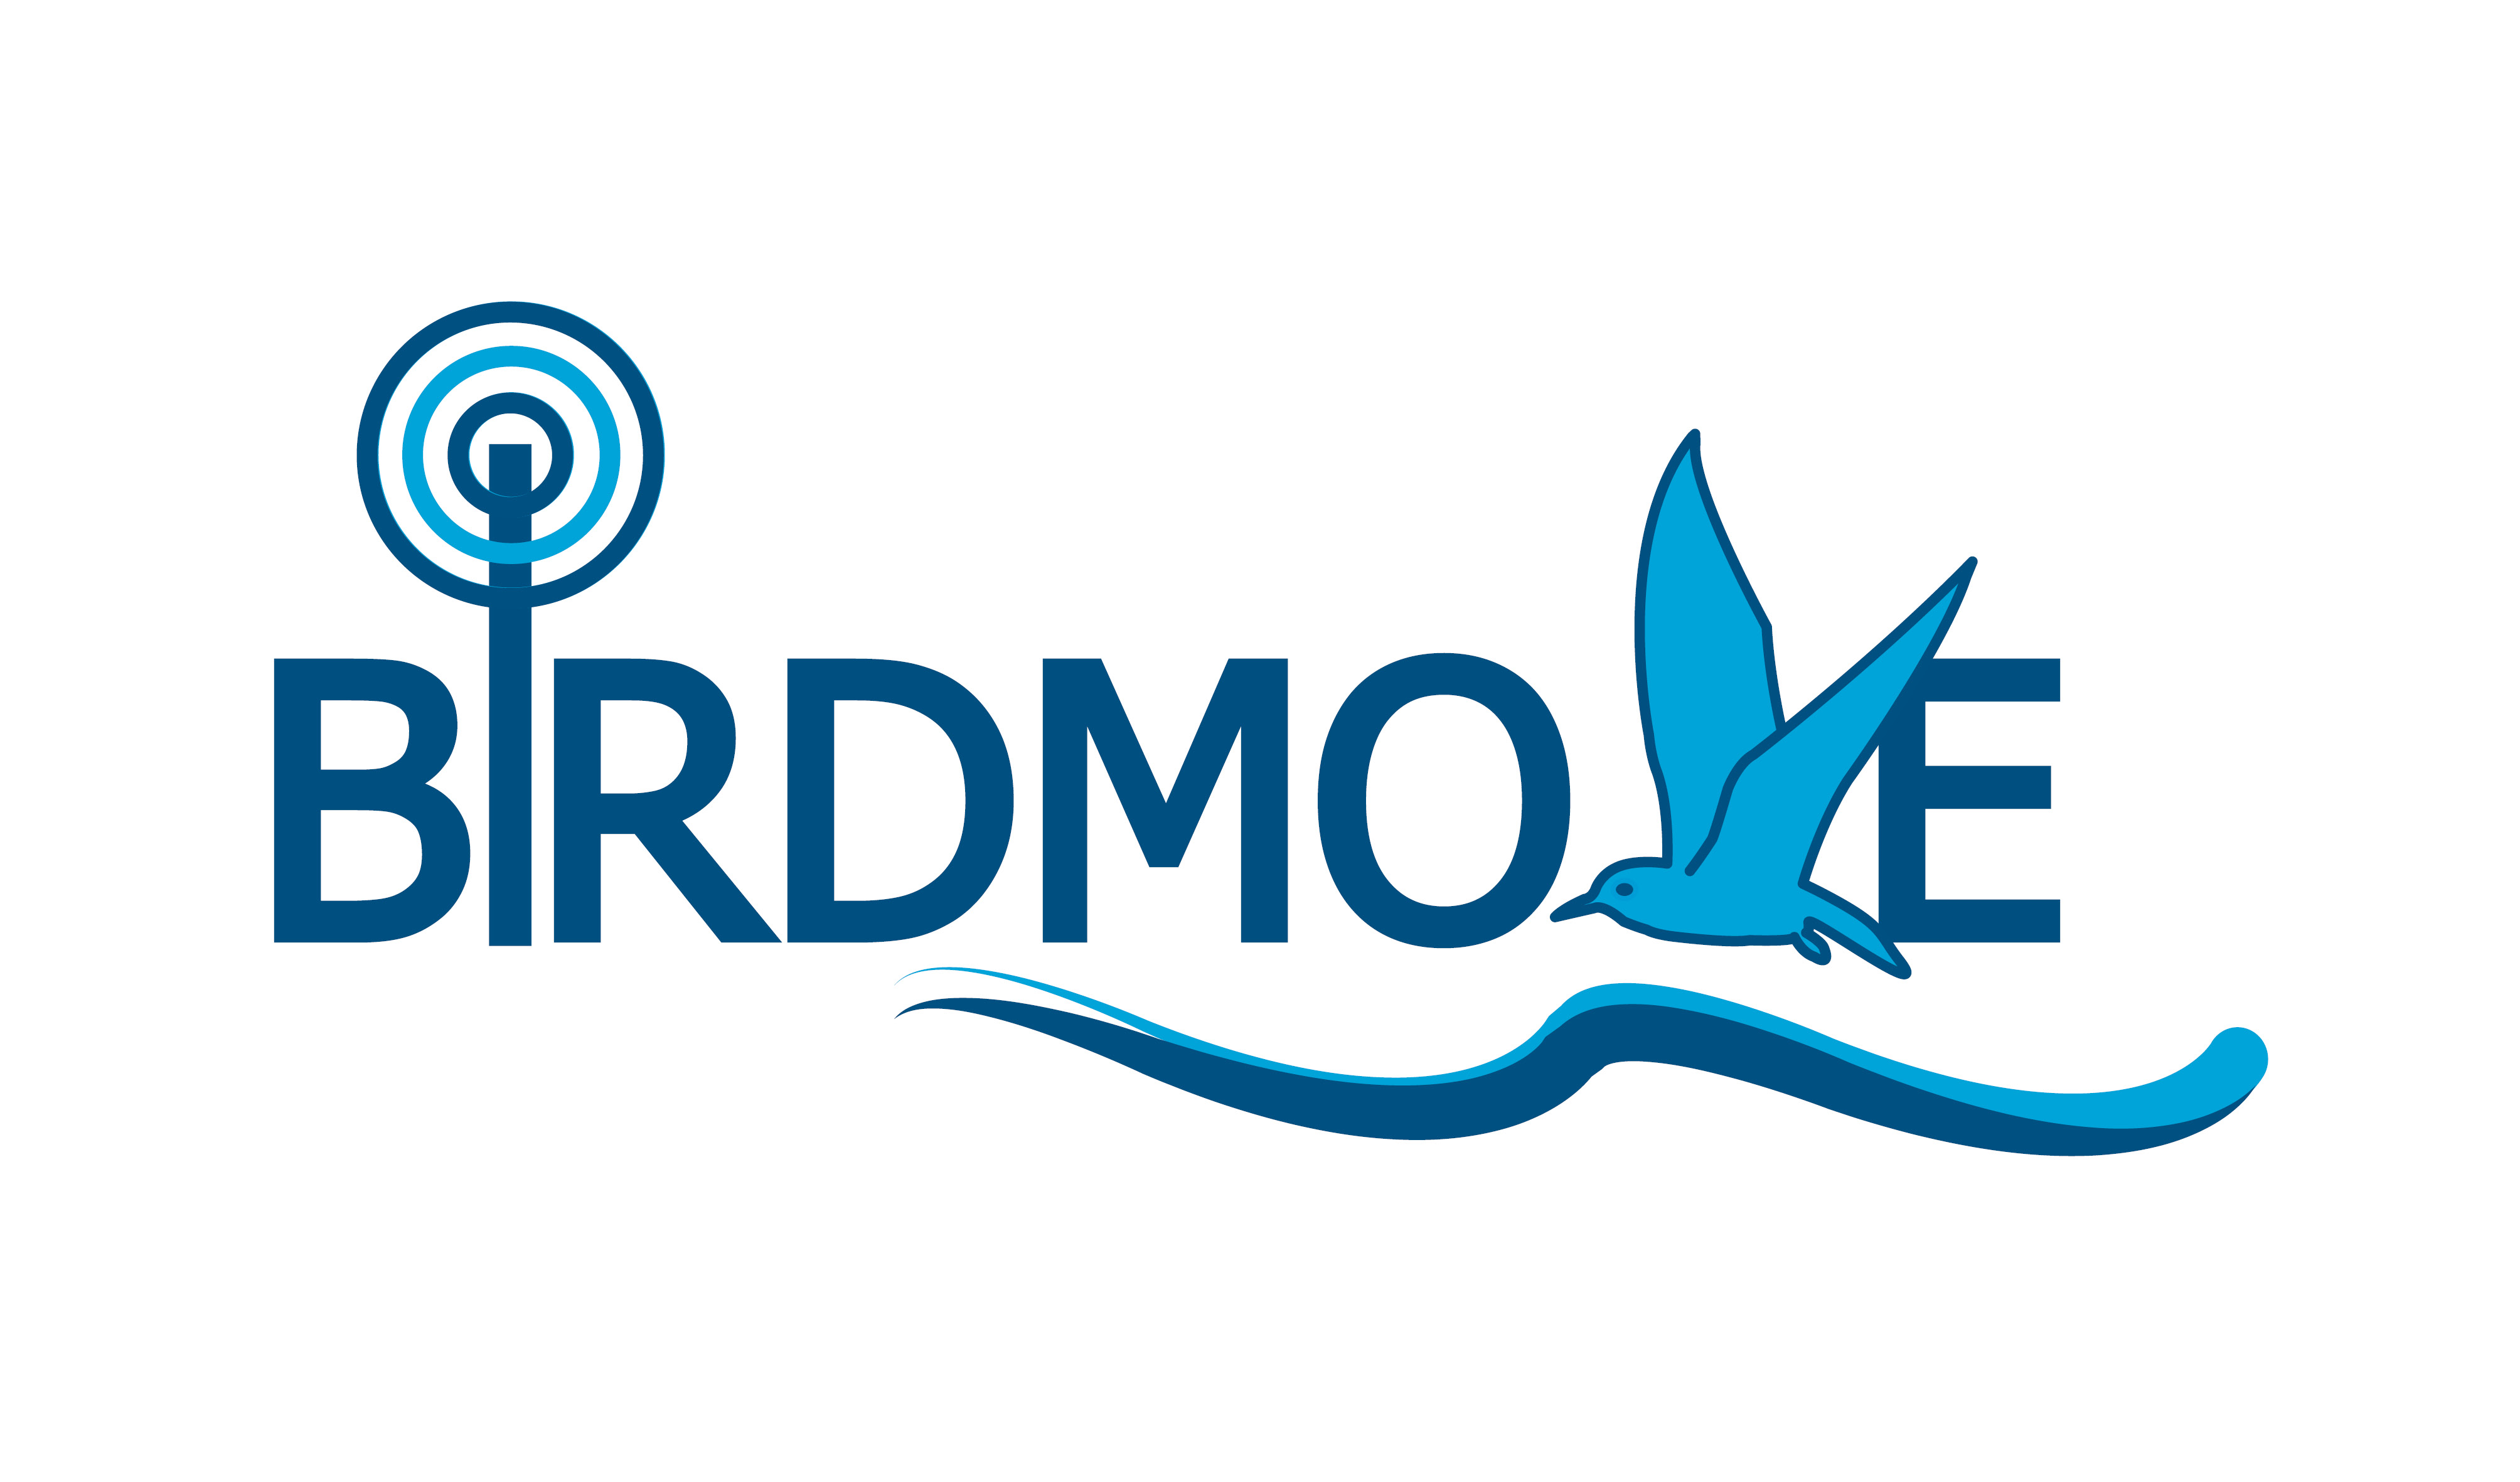 BIRDMOVE